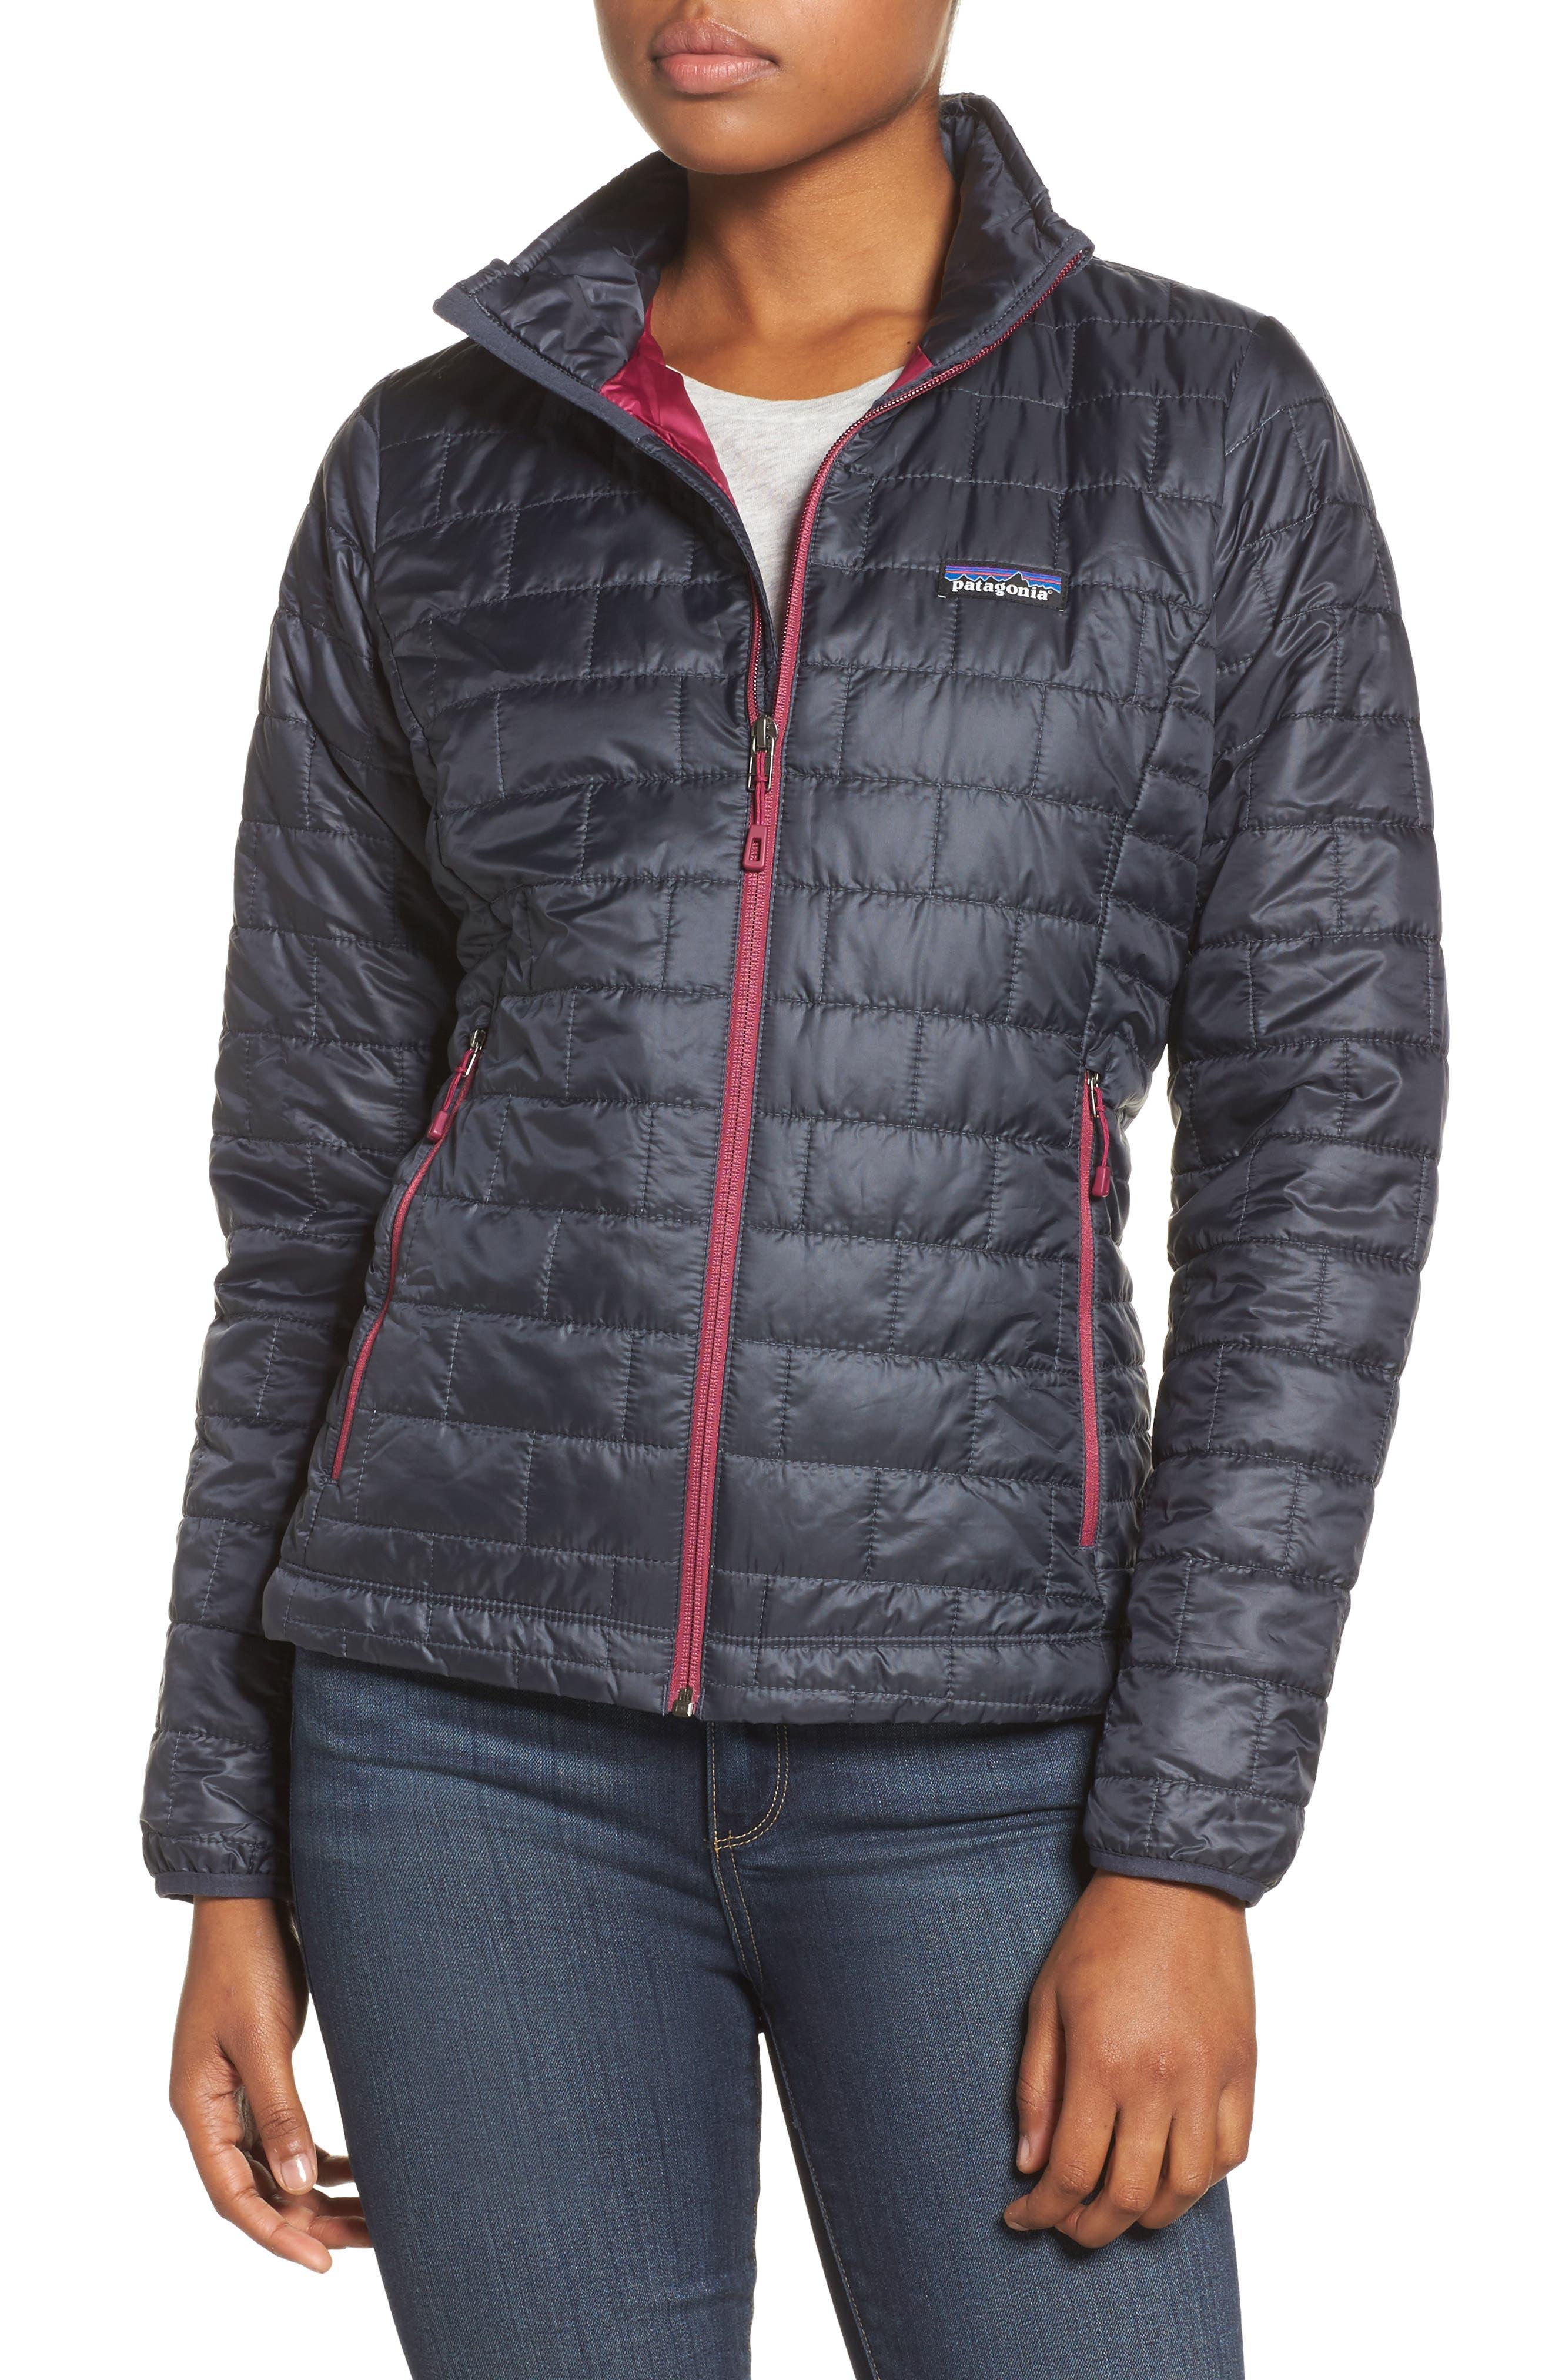 Patagonia Nano Puff® Water Resistant Jacket